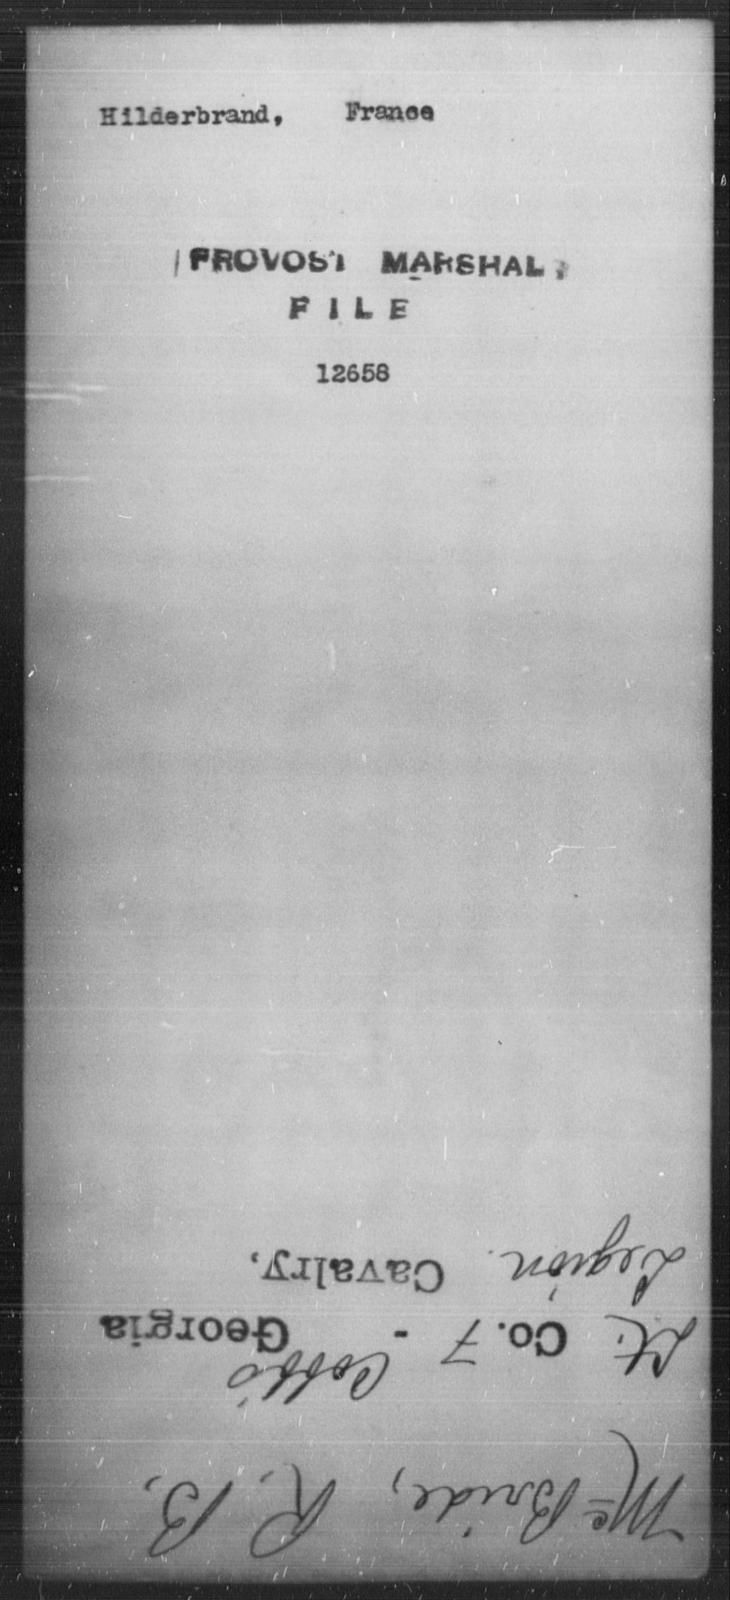 Hilderbrand, France - State: [Blank] - Year: [Blank]